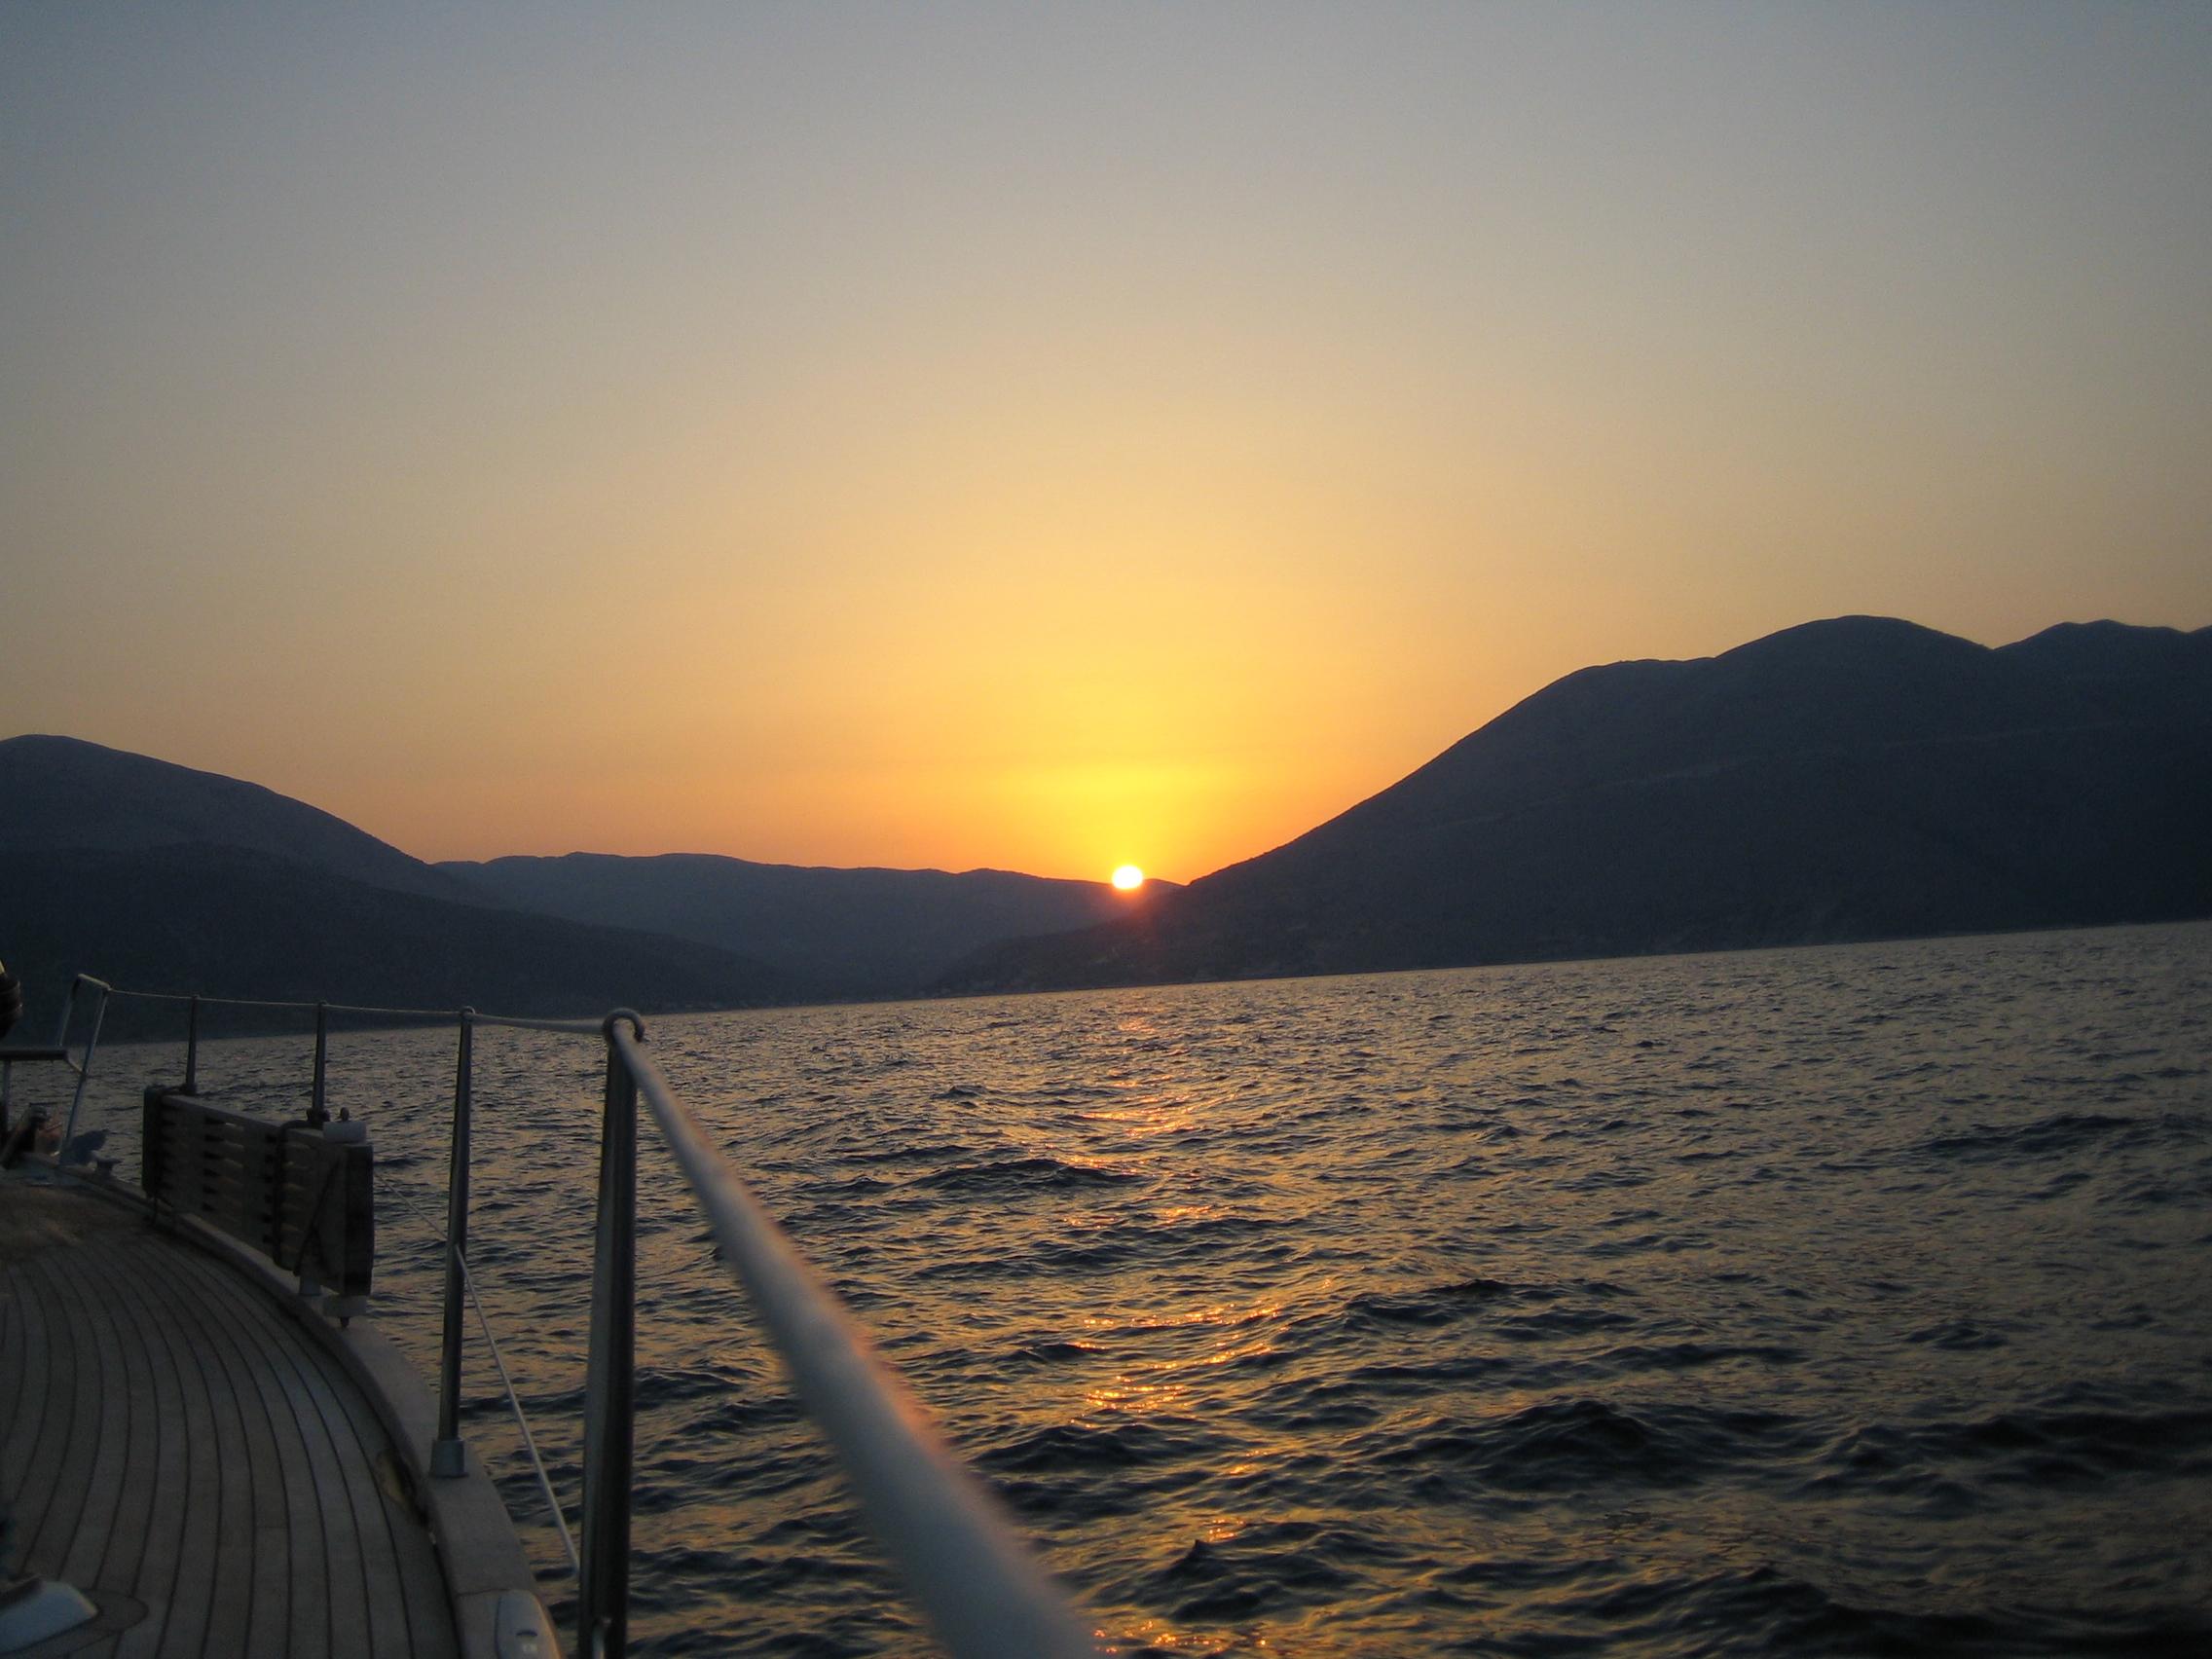 Sonnenuntergang 19